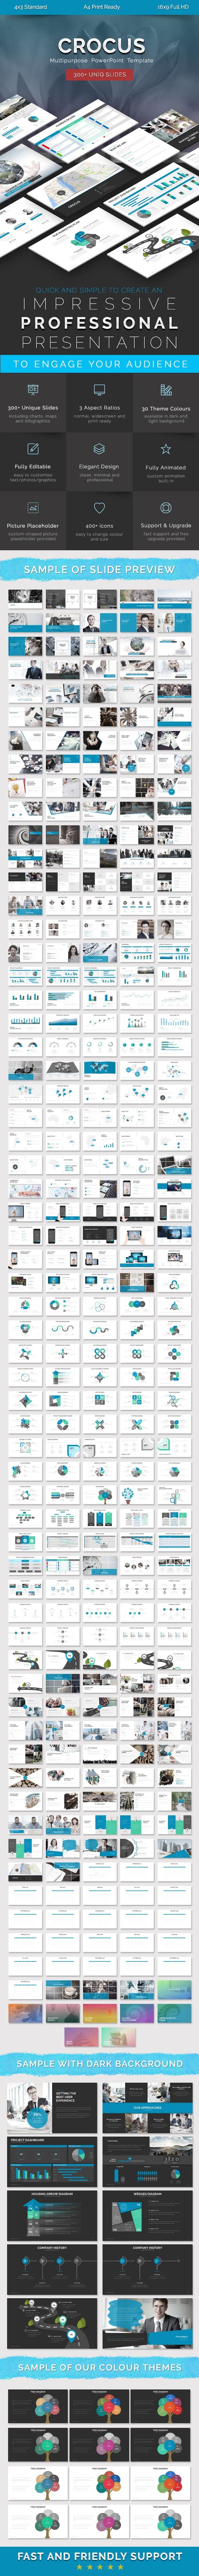 Crocus – Multipurpose PowerPoint Template - Business PowerPoint Templates